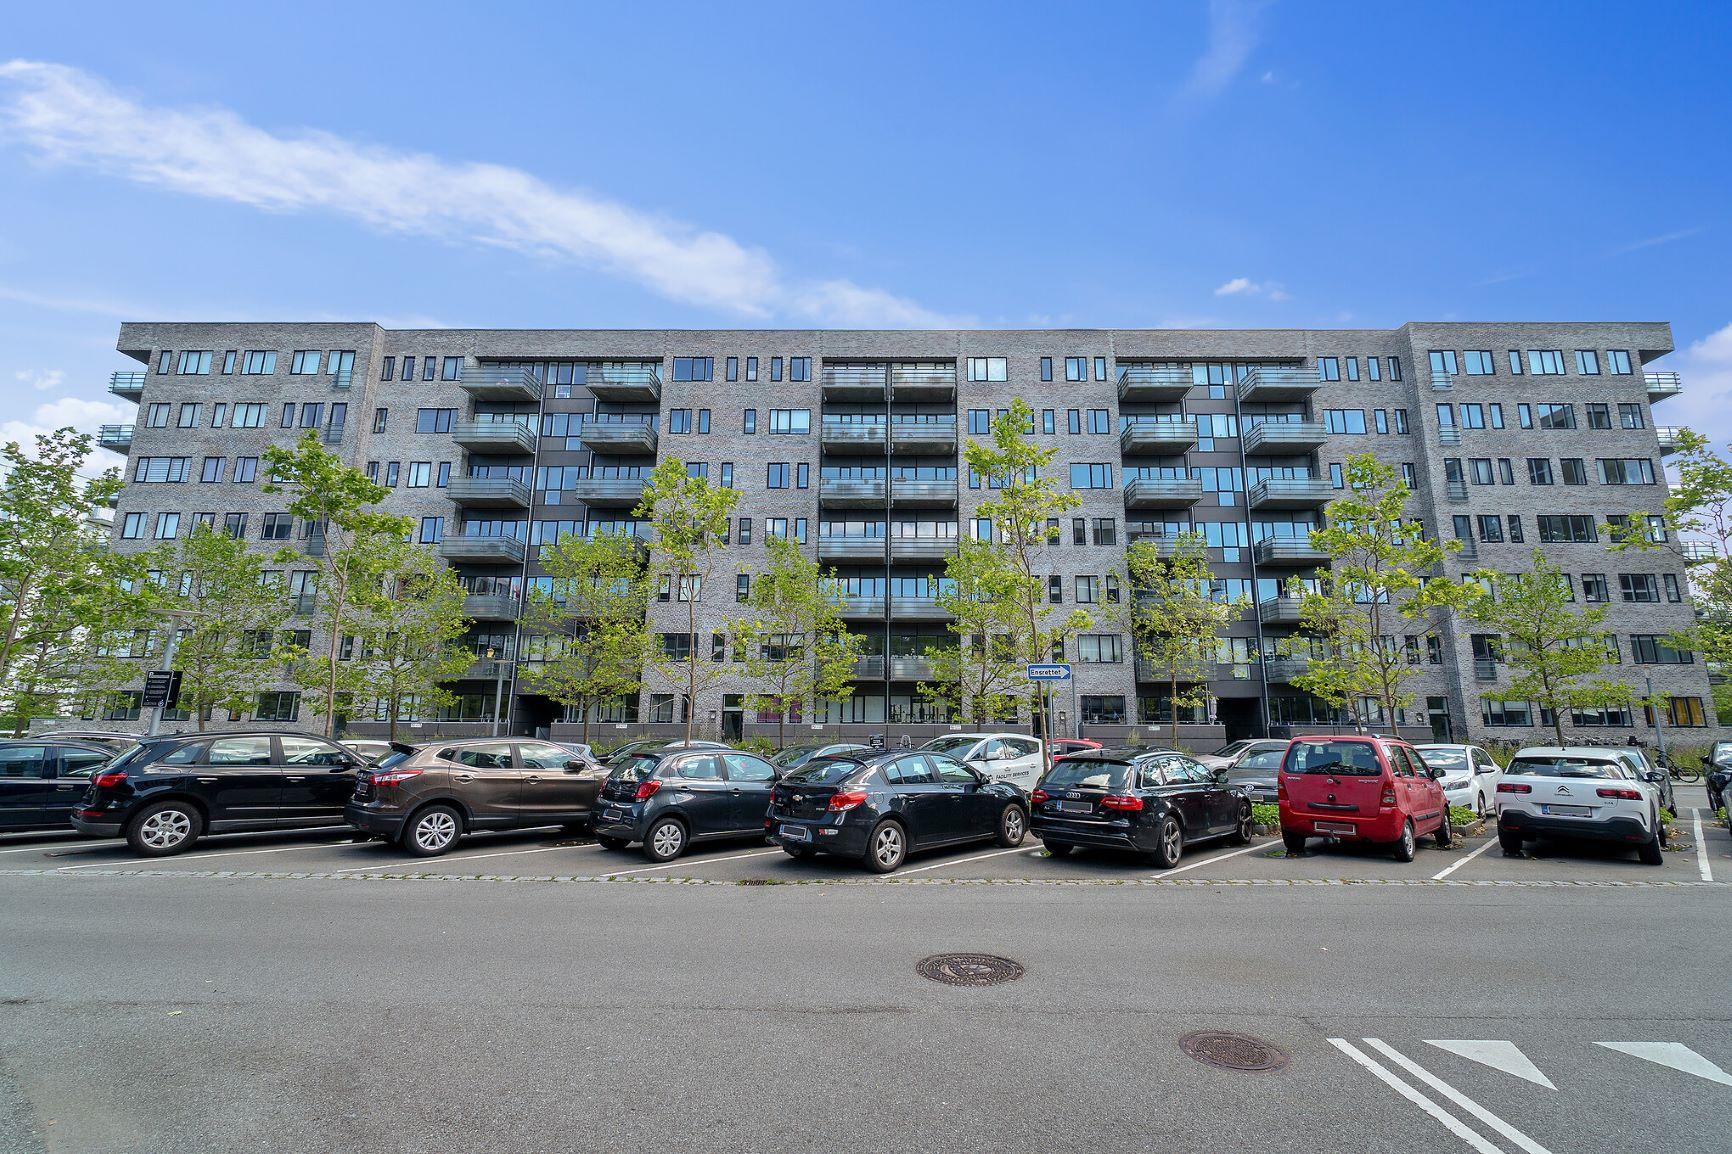 Lejebolig på Gyngemose Parkvej 10, 4. th., 2860 Søborg